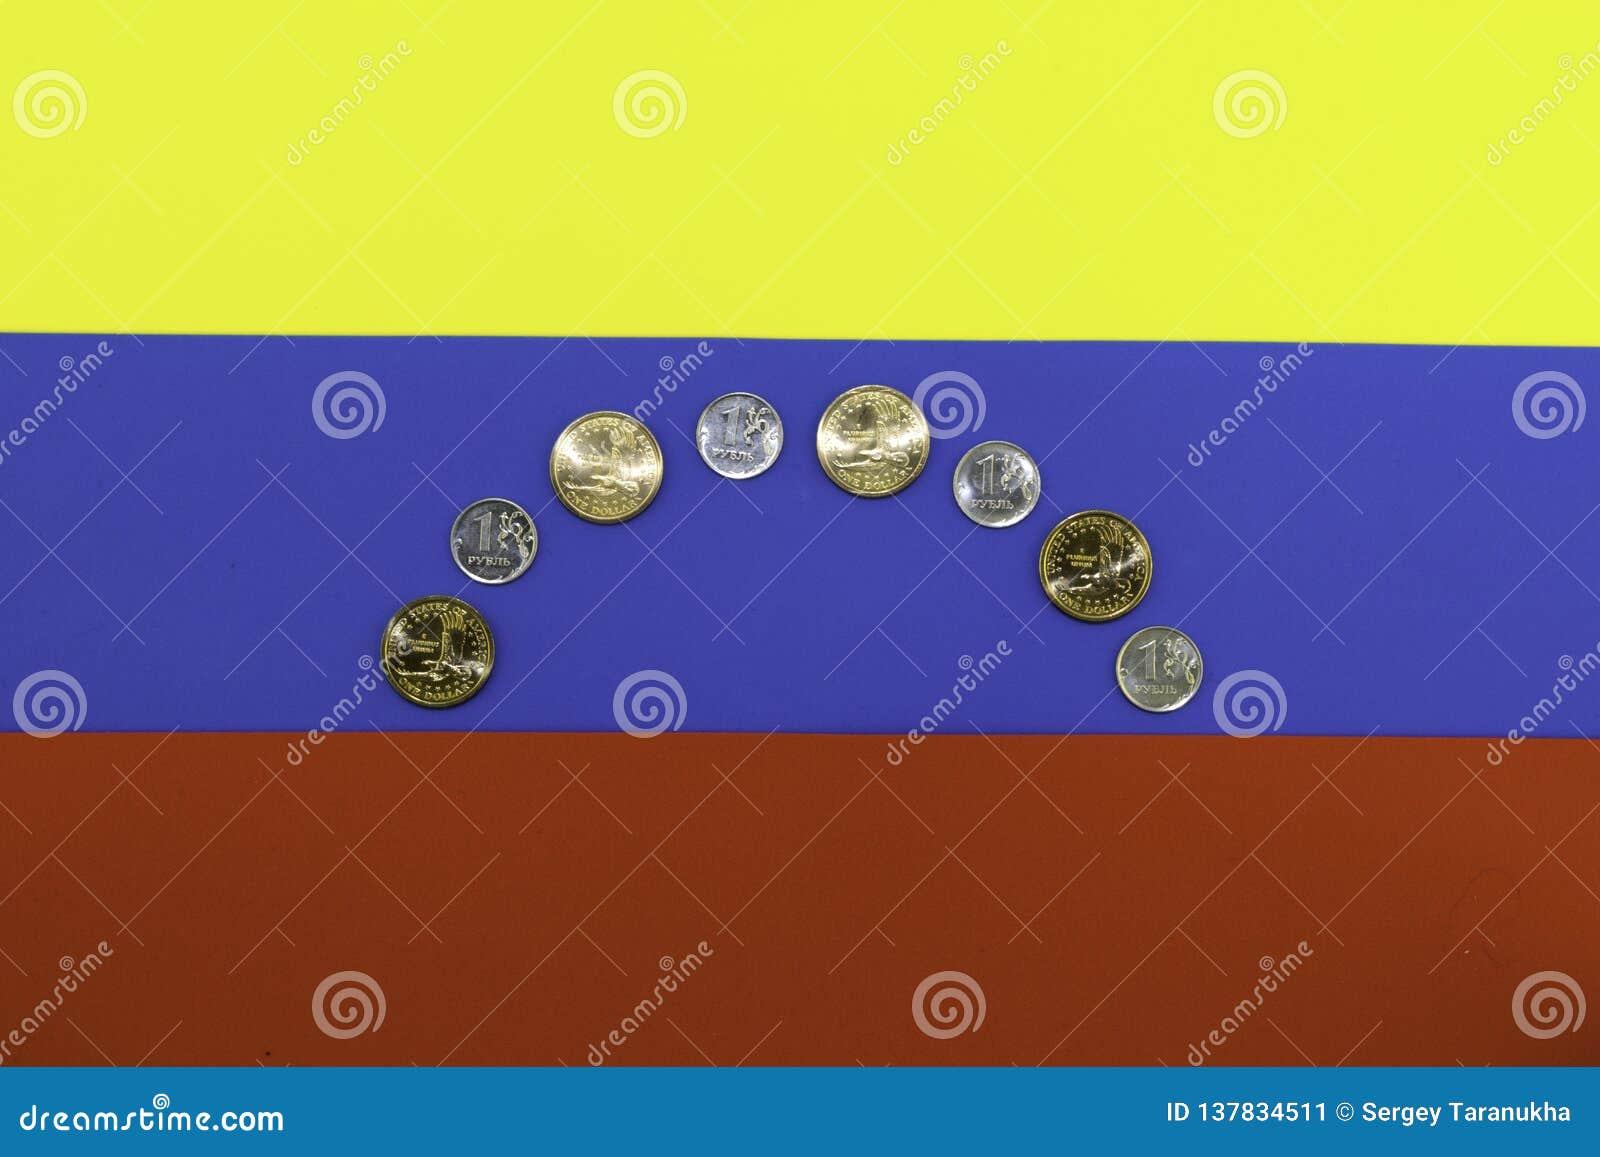 Crisis in venezuela stylized flag of venezuela